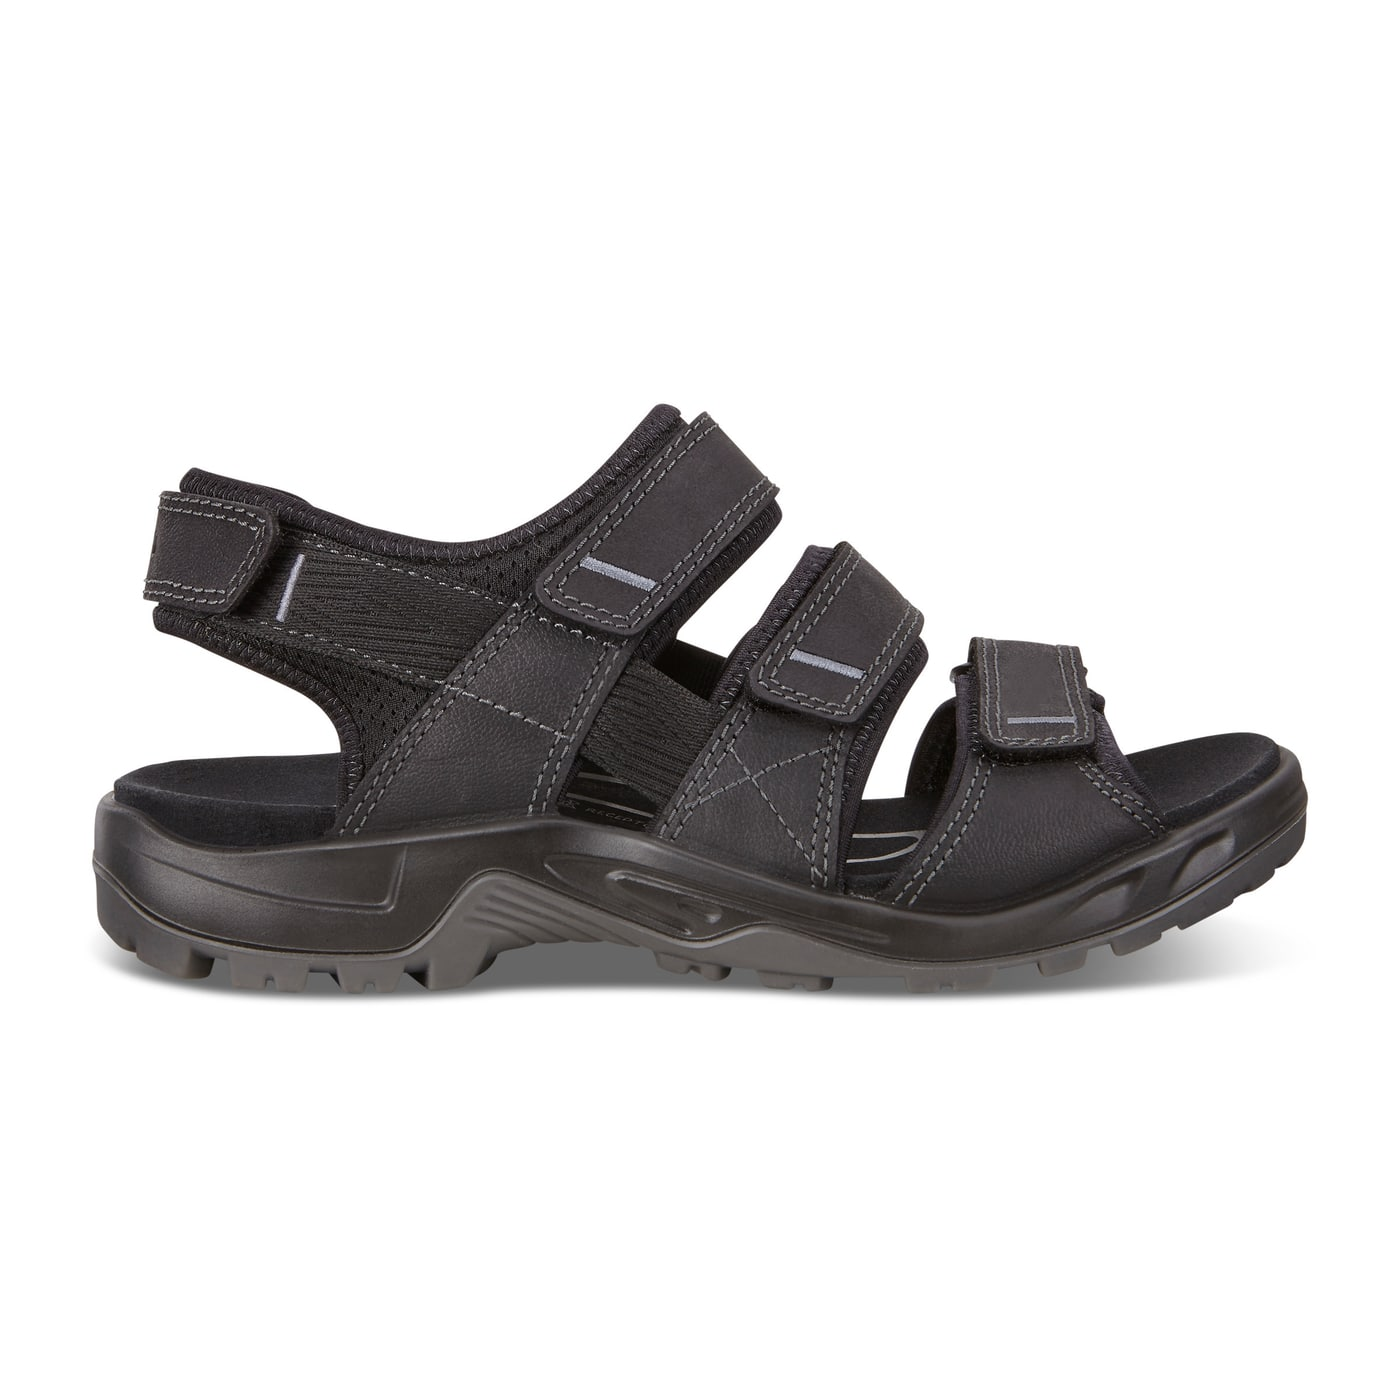 Ecco Men's Offroad Flat Sandal $70, Ecco Women's Vibration 1.0 Mary Jane (concrete) $63 & More + Free Shipping